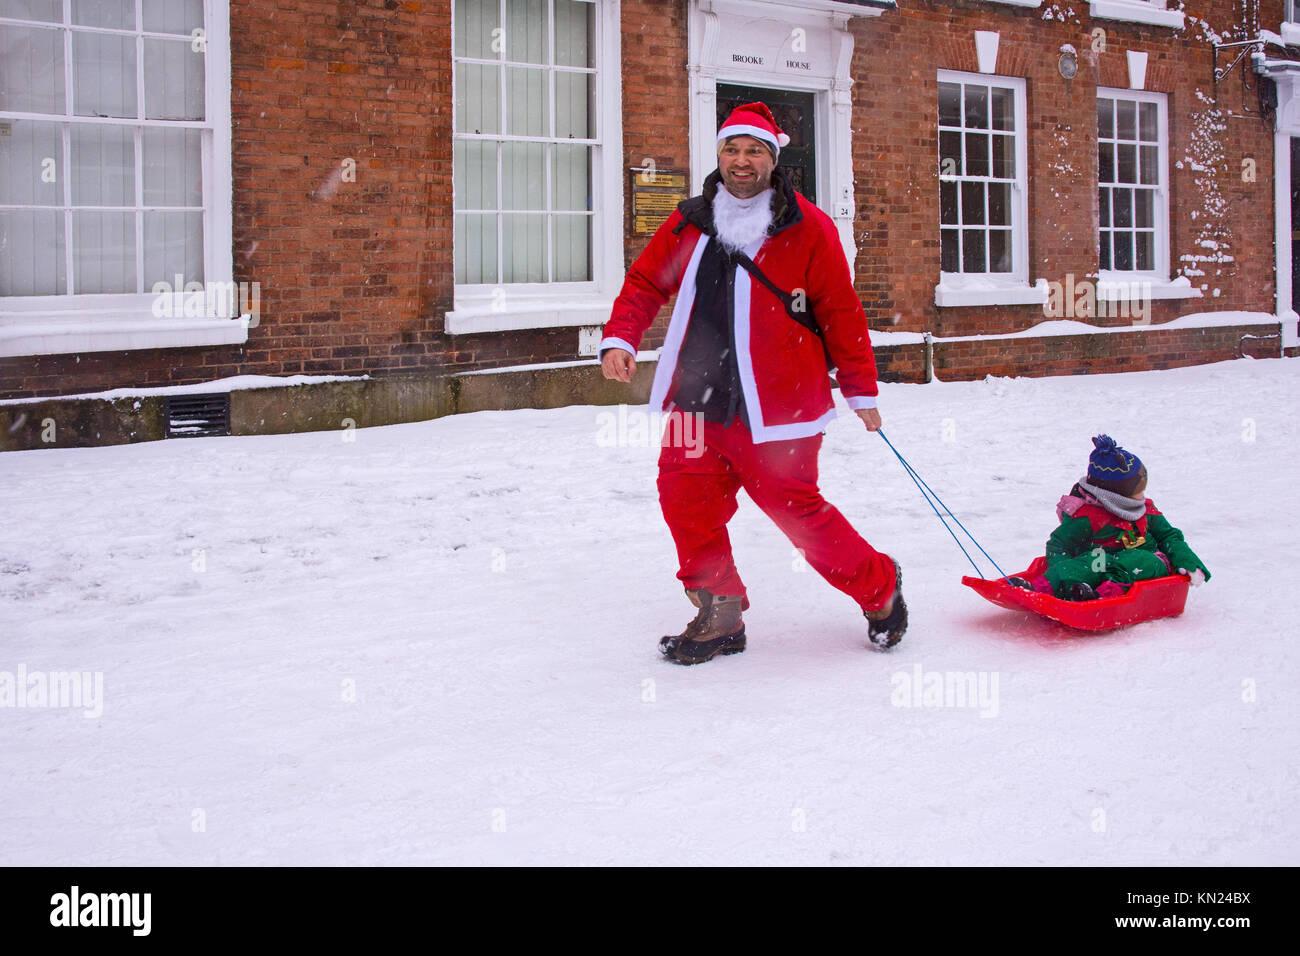 Lichfield, UK. 10th Dec, 2017. A happy father tows his child on a sledge in the Lichfield Santa Dash in Dam Street - Stock Image